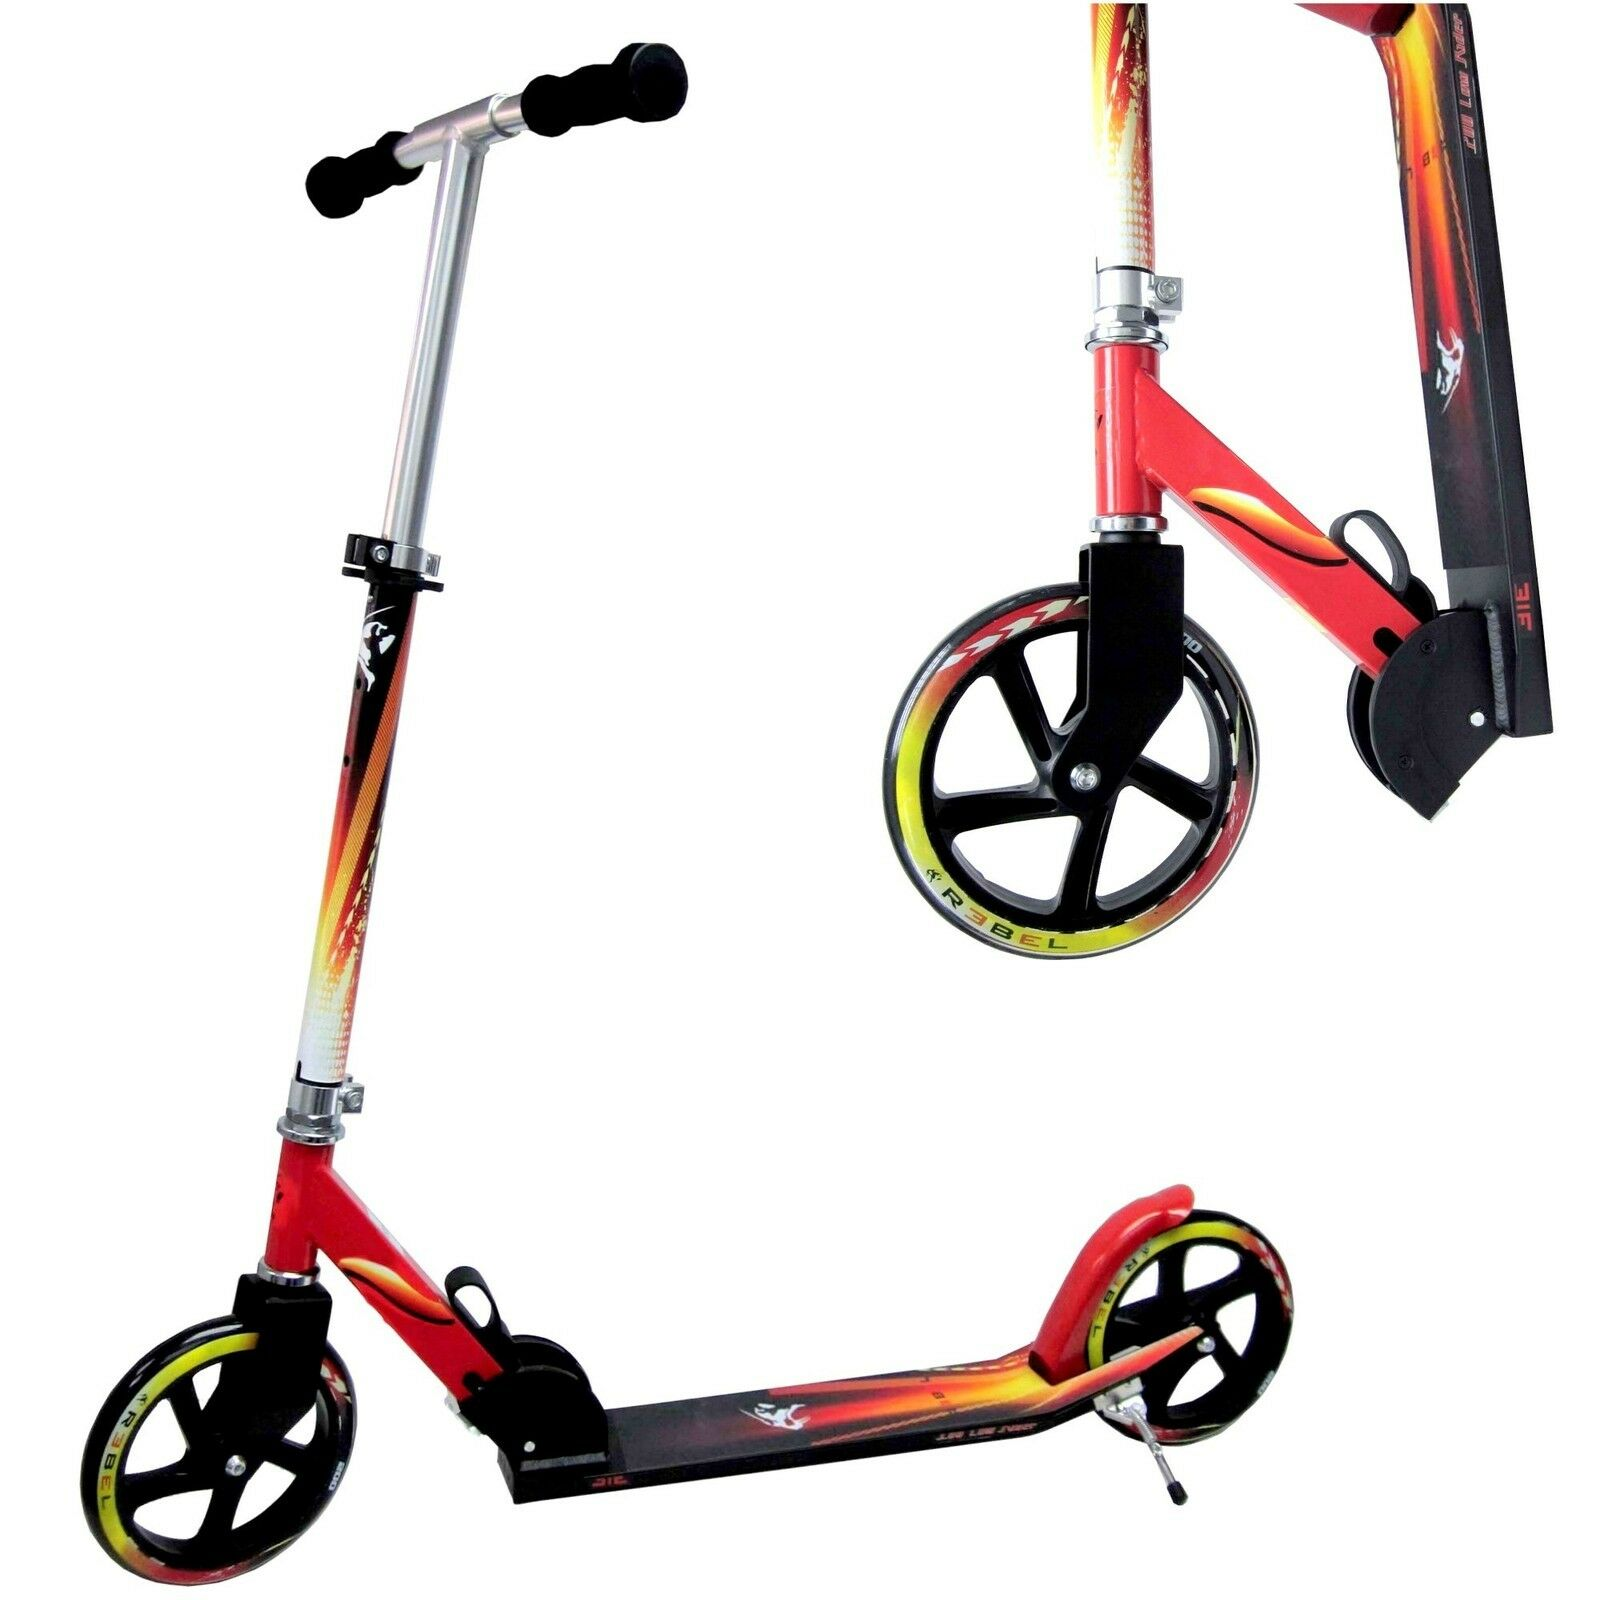 Scooter Rebel Niedrig Rider Big wheel 205 Roller Trotinette Spezial Angebot